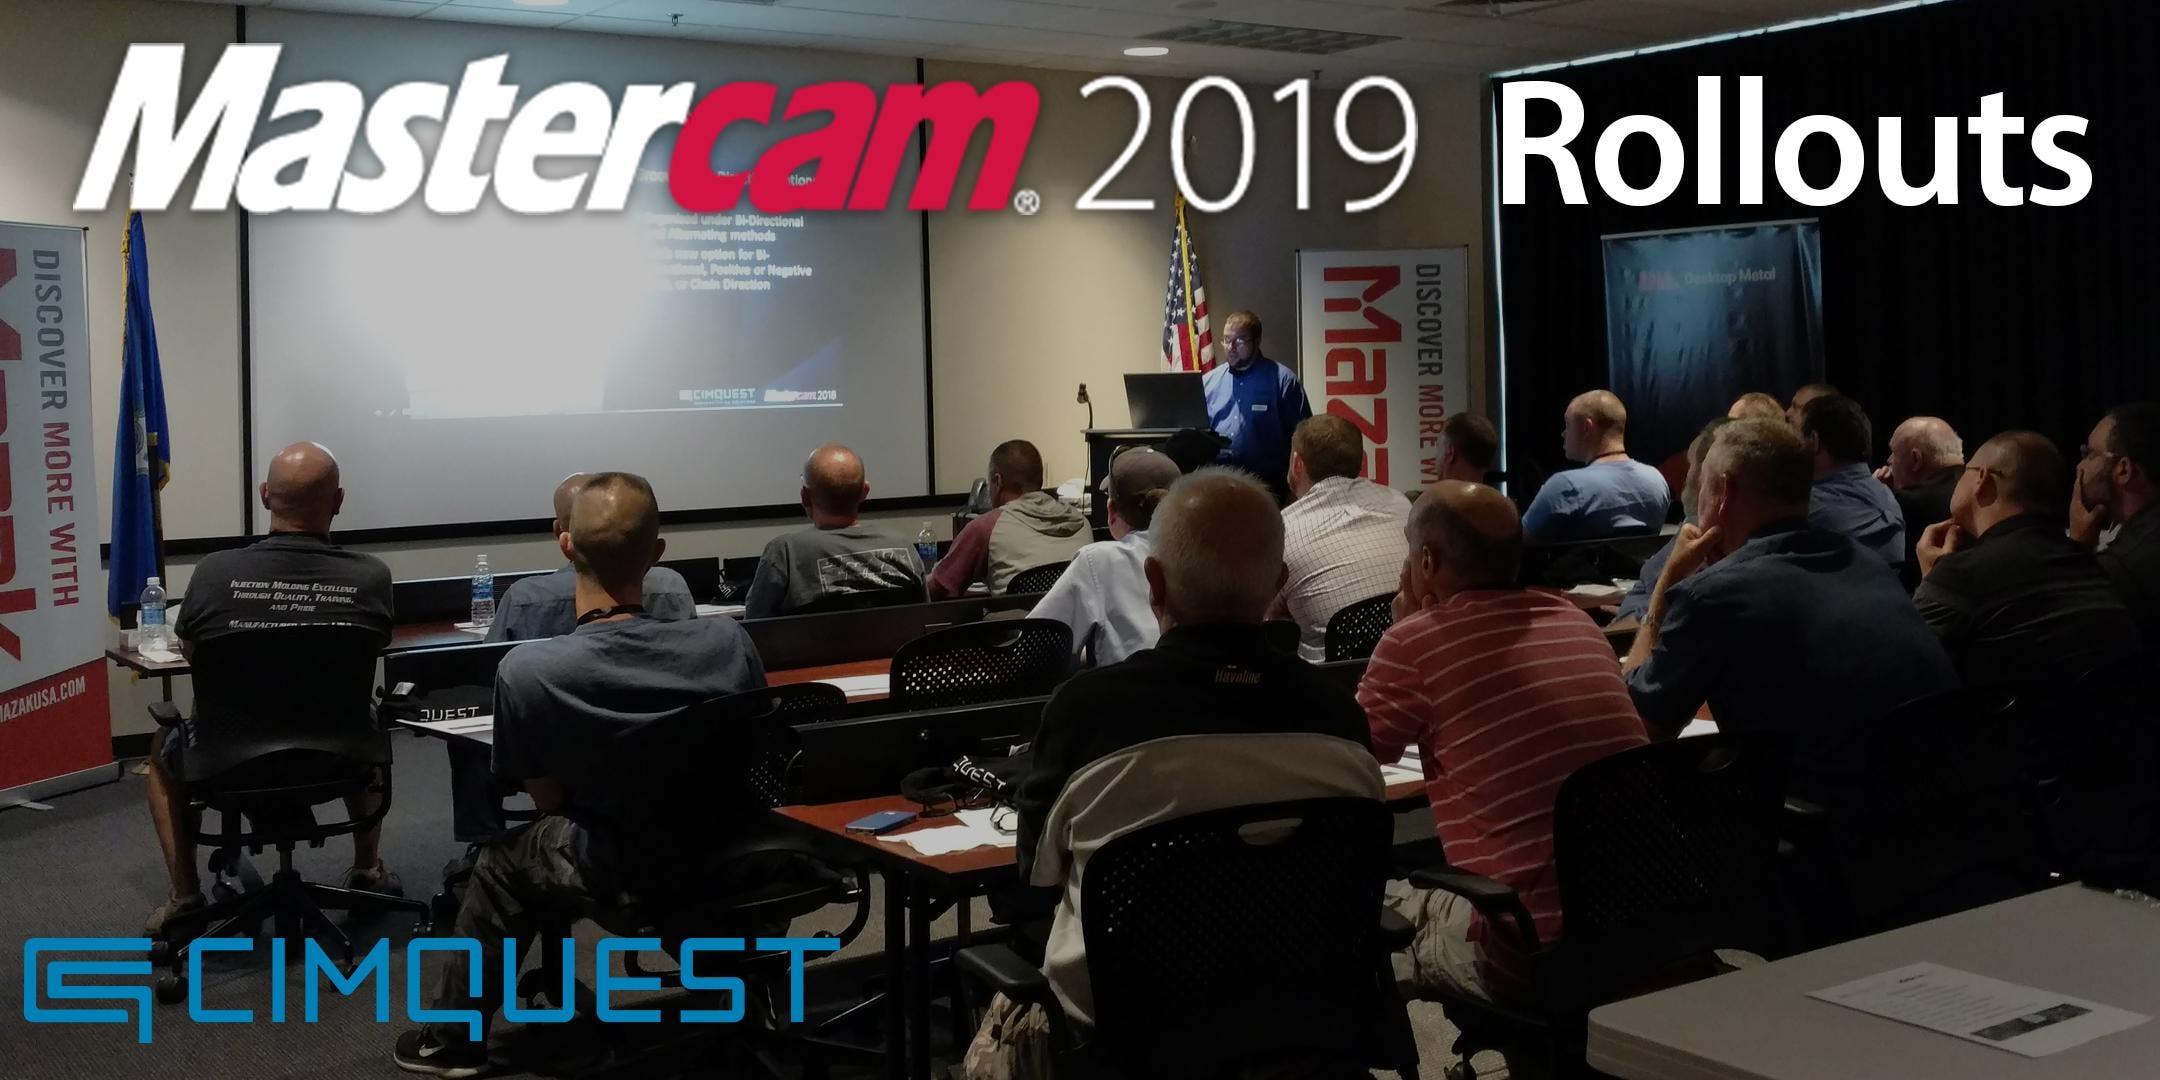 Mastercam 2019 Rollout - Dublin VA